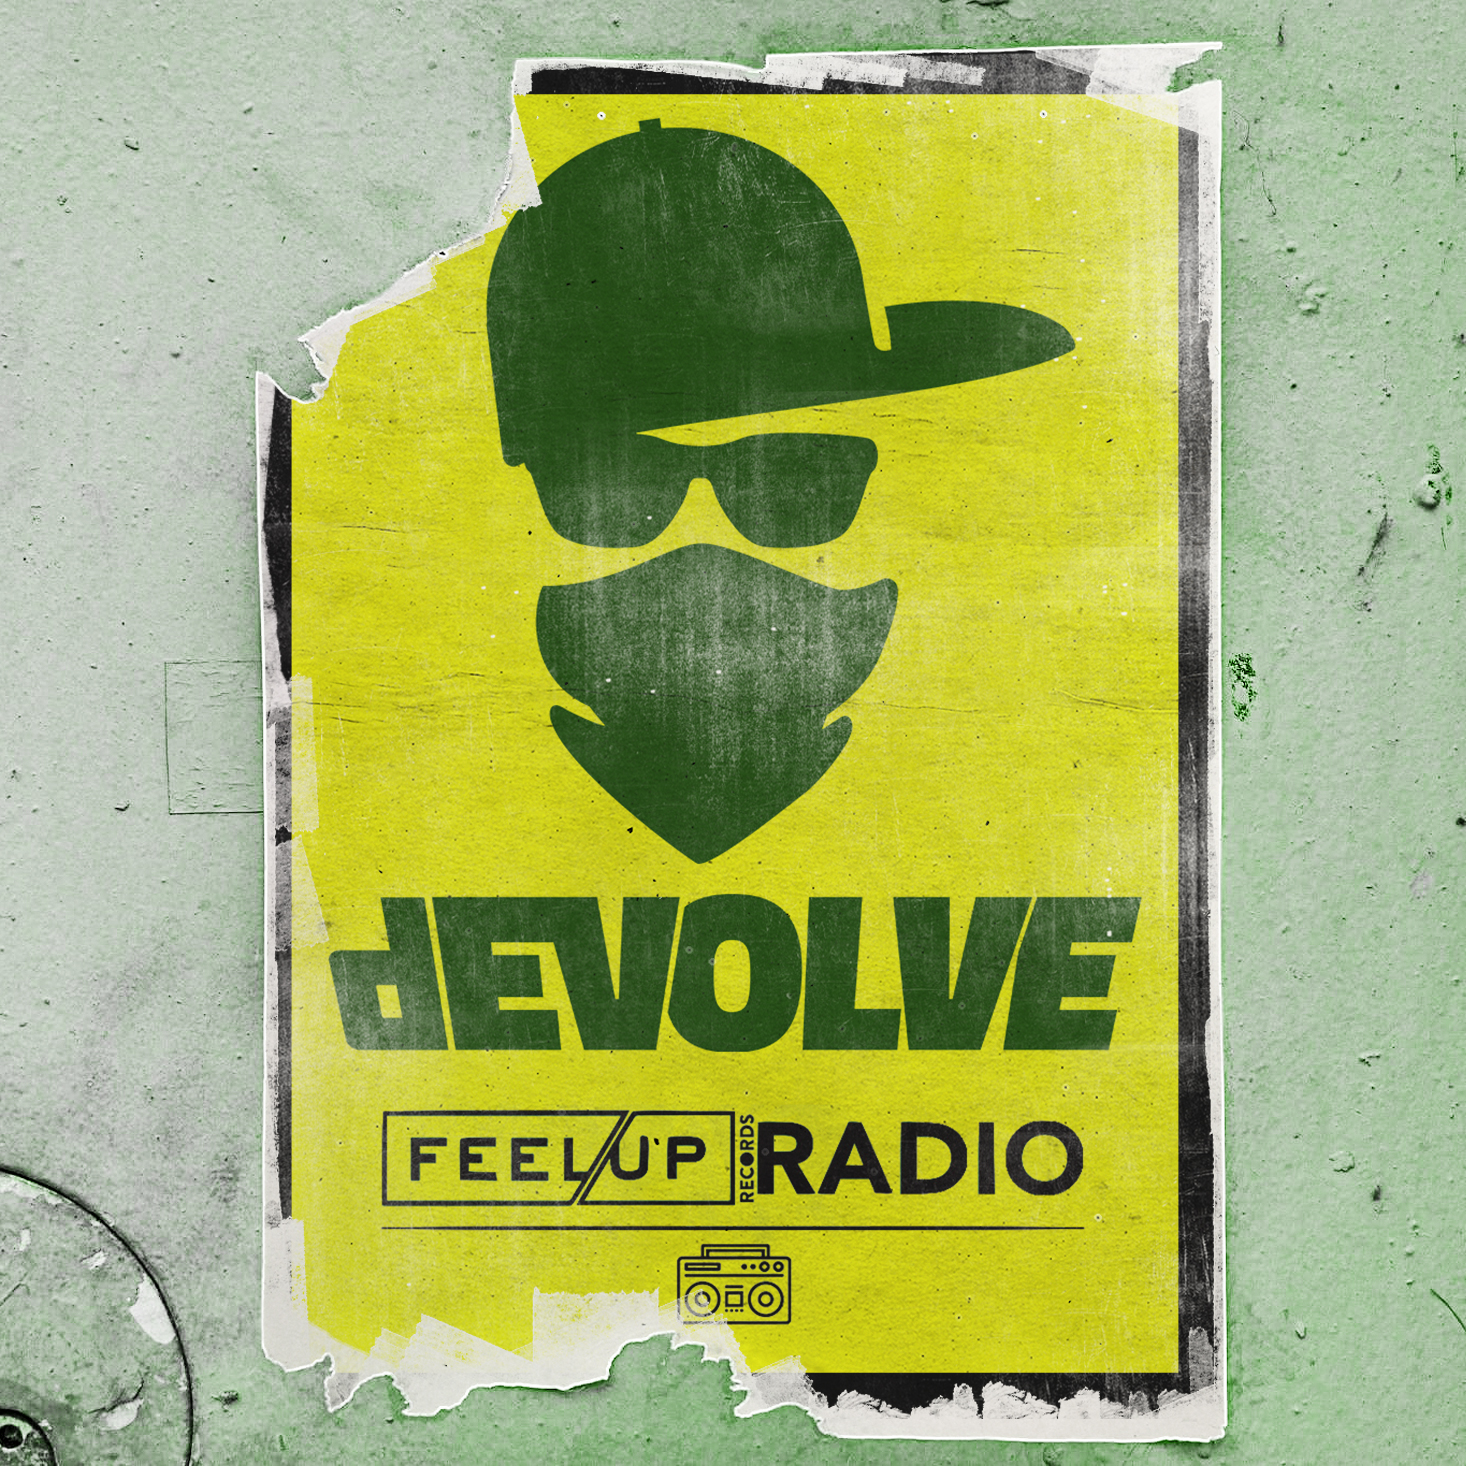 dEVOLVE - Feel Up Radio.jpg